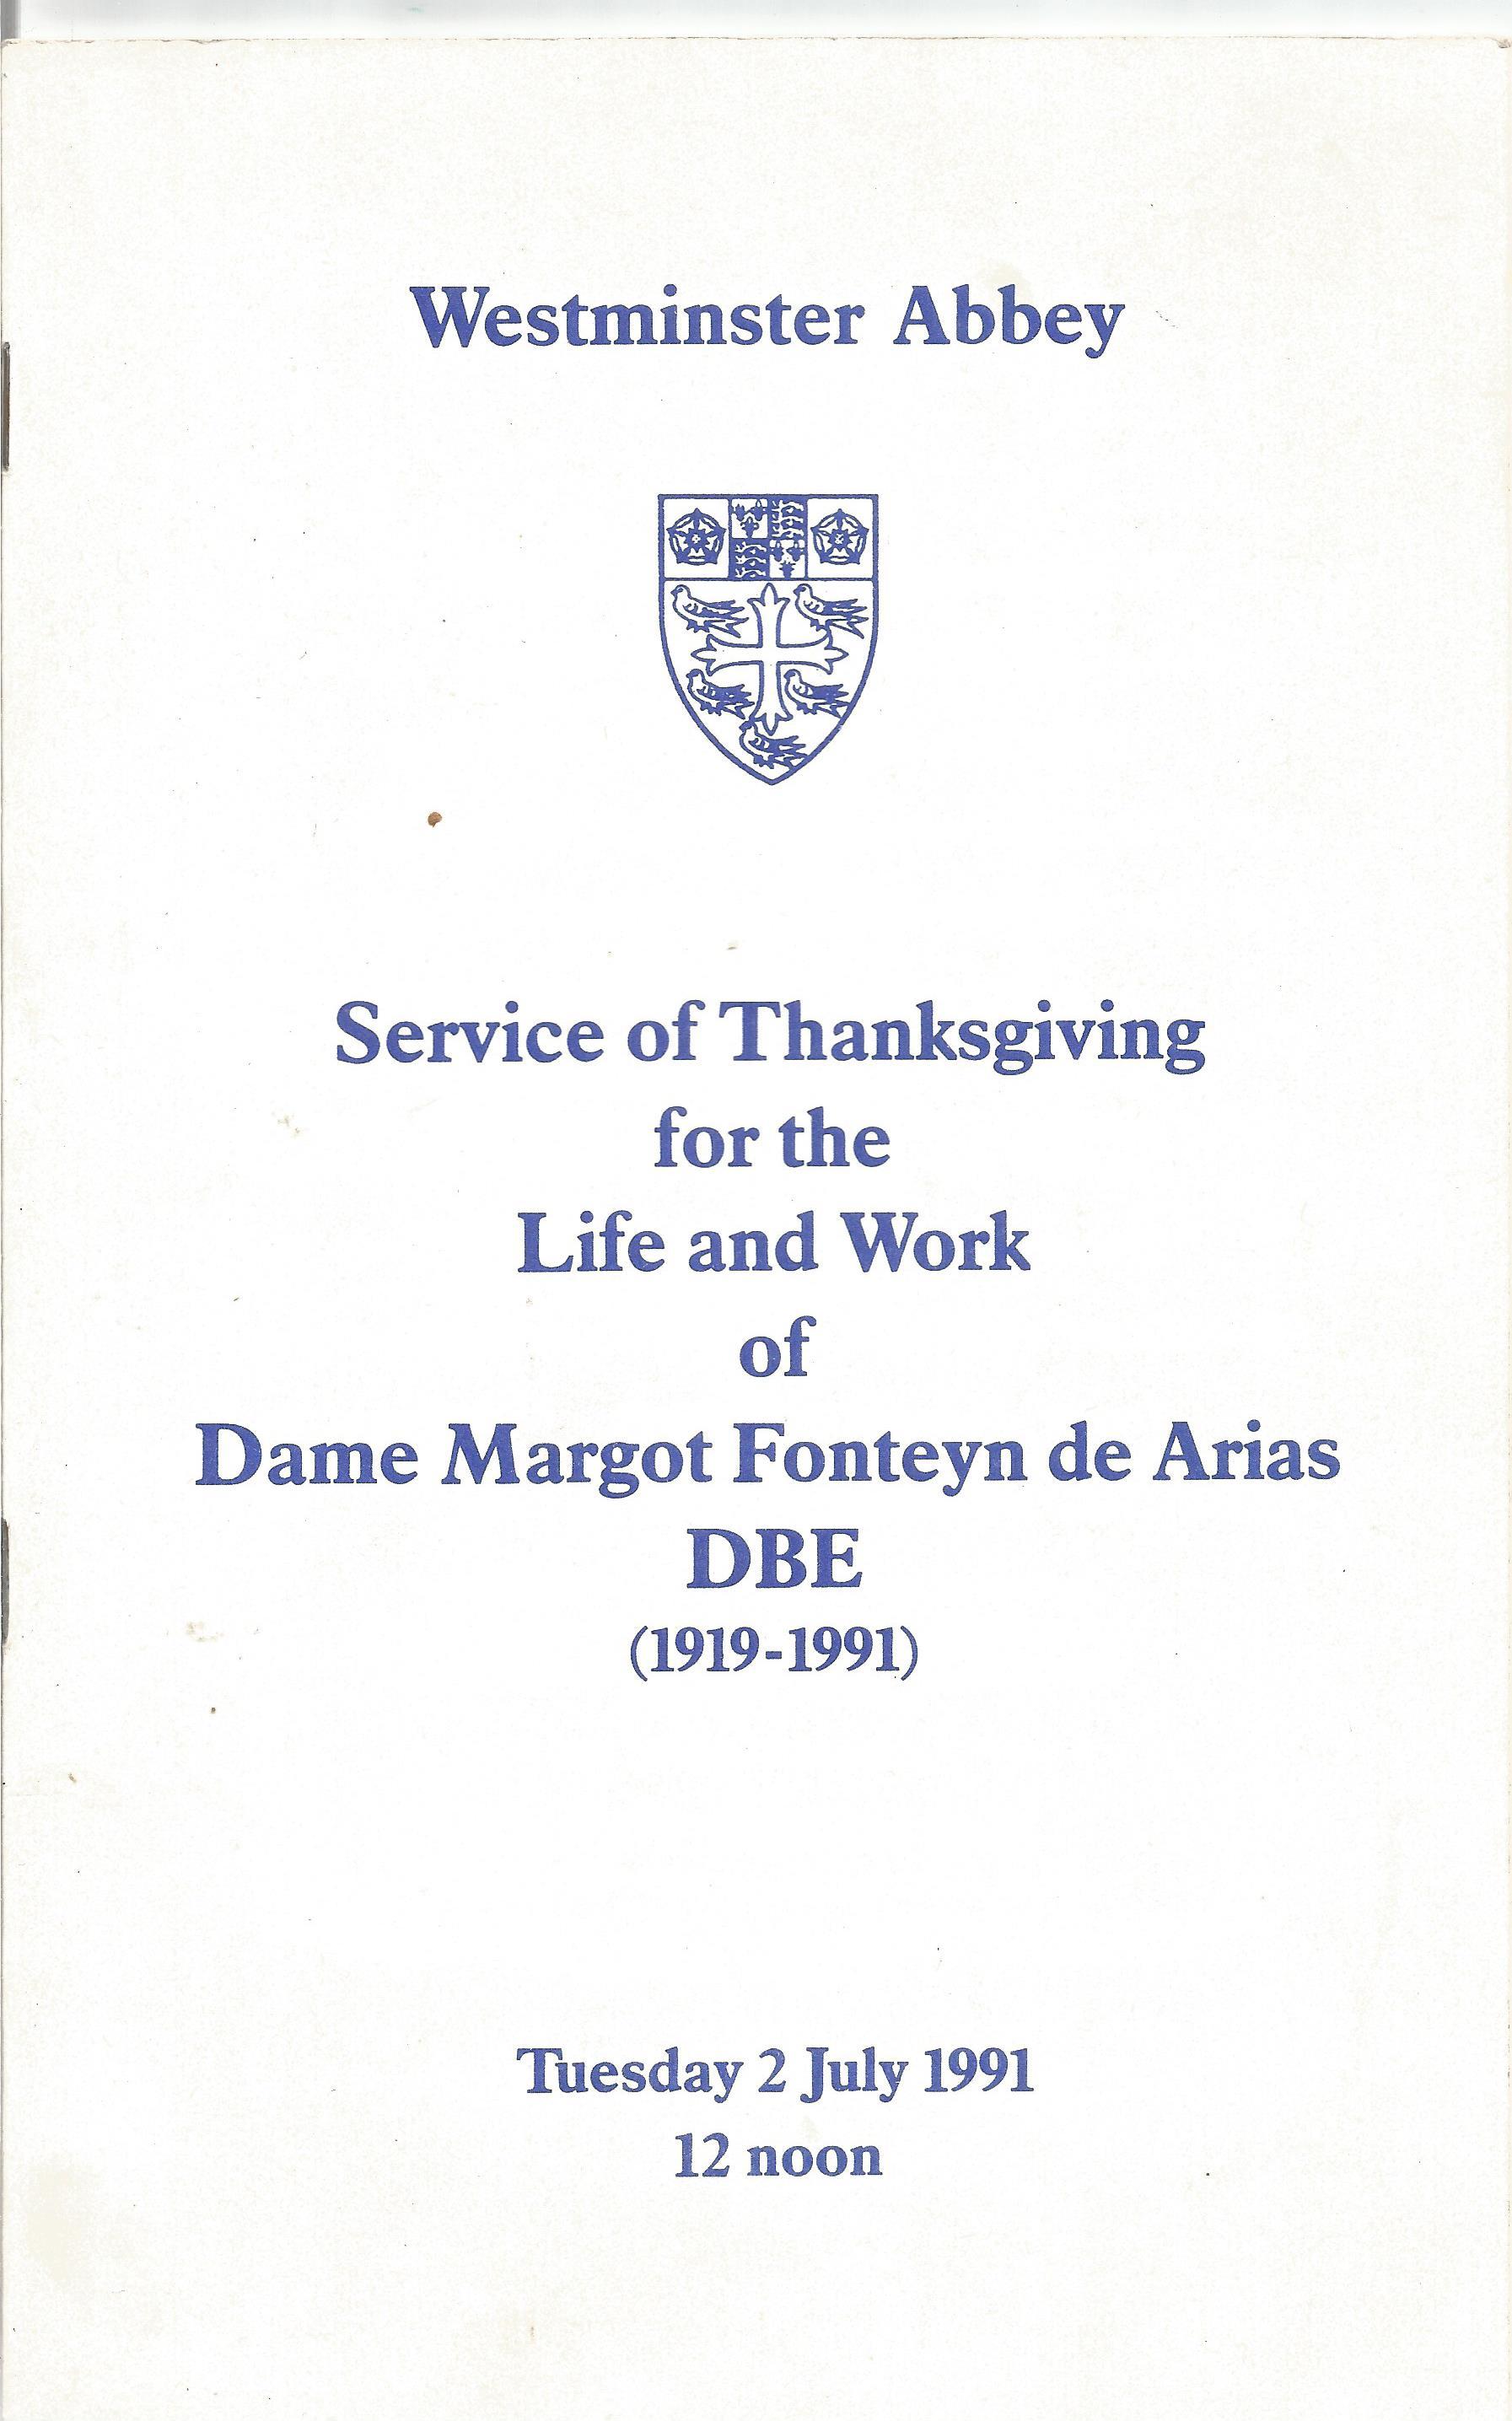 Opera in House Brochure A Dance Spectacular In Tribute to Dame Alicia Markova DBE 1990 Sadler's - Image 4 of 4